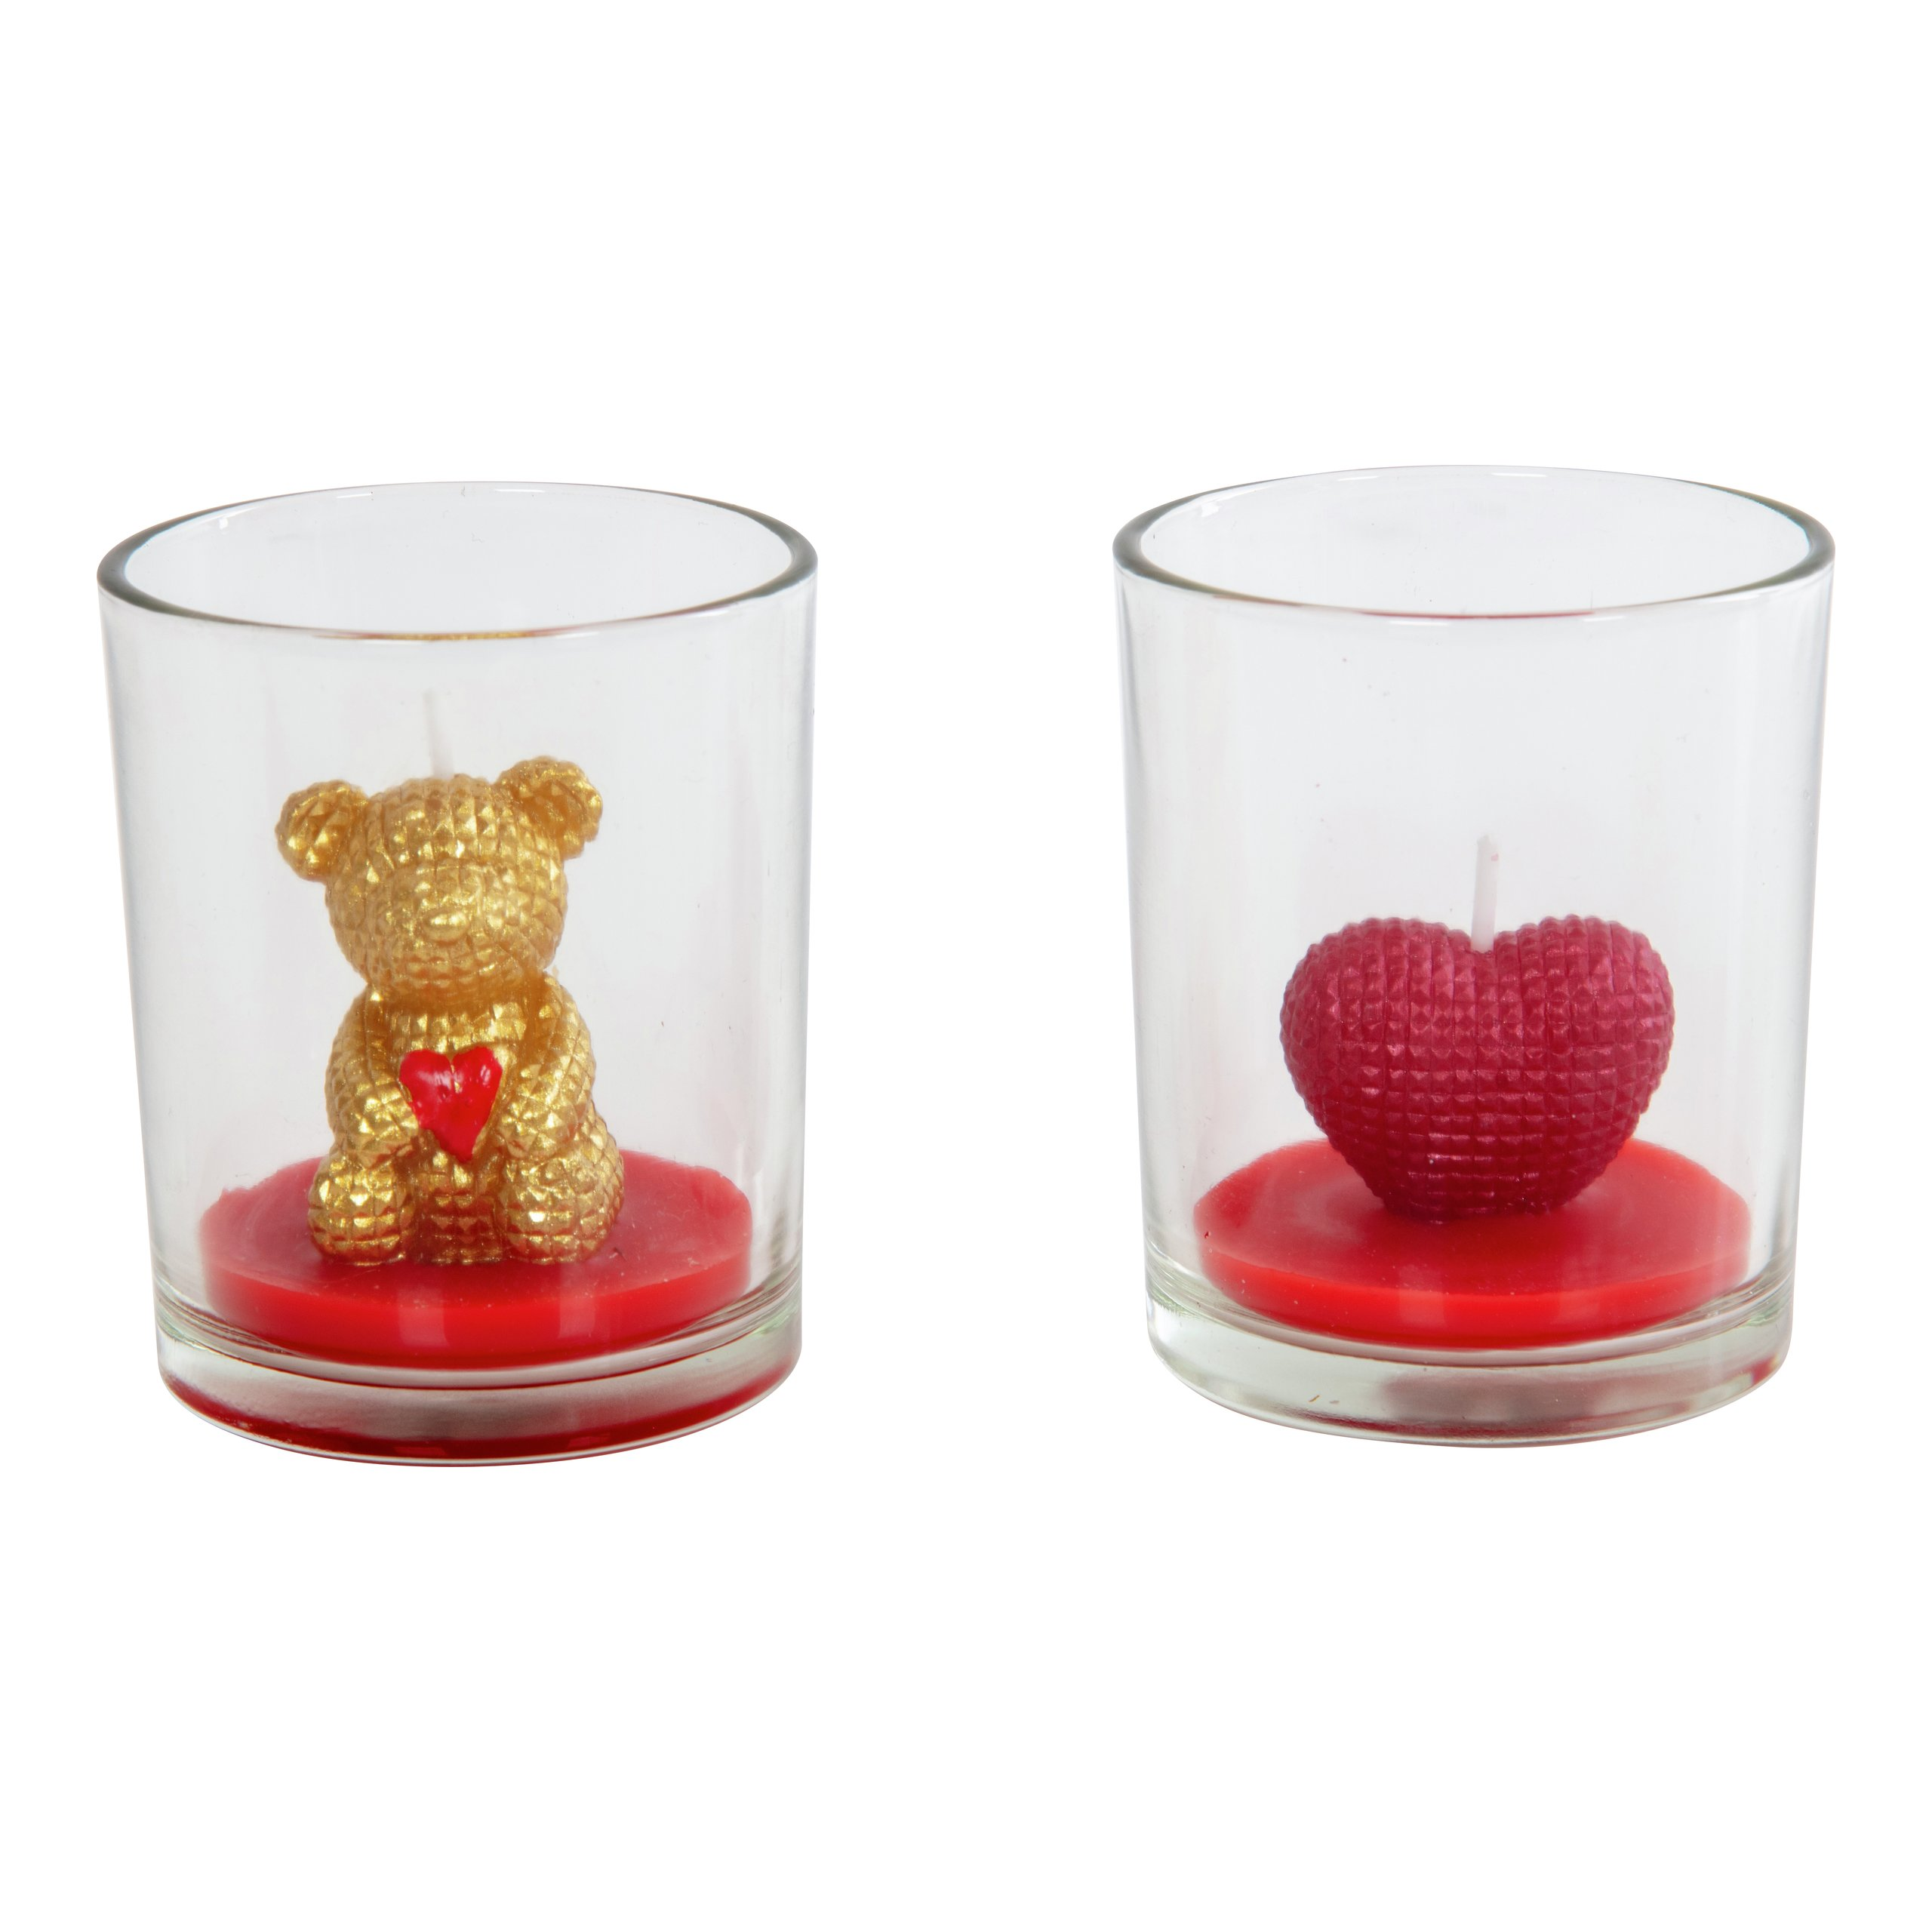 FIGUR VALENTINELYS I GLASS V2 3h-STE8300